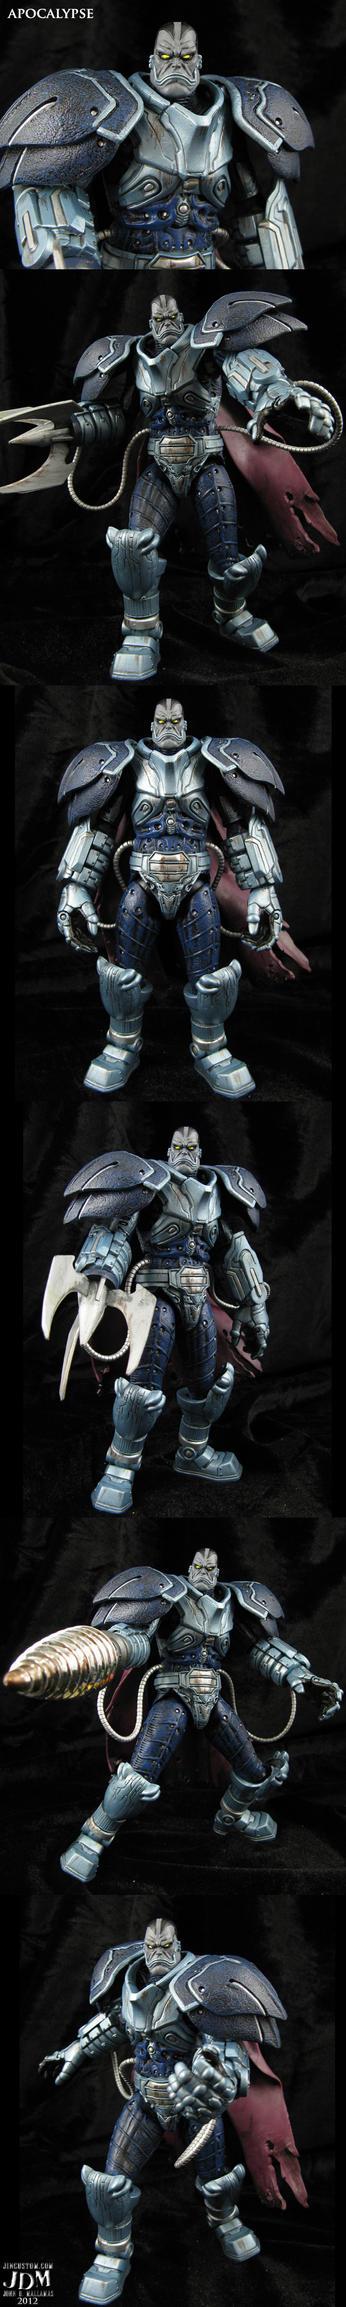 Custom Apocalypse Marvel movie style figure by Jin-Saotome